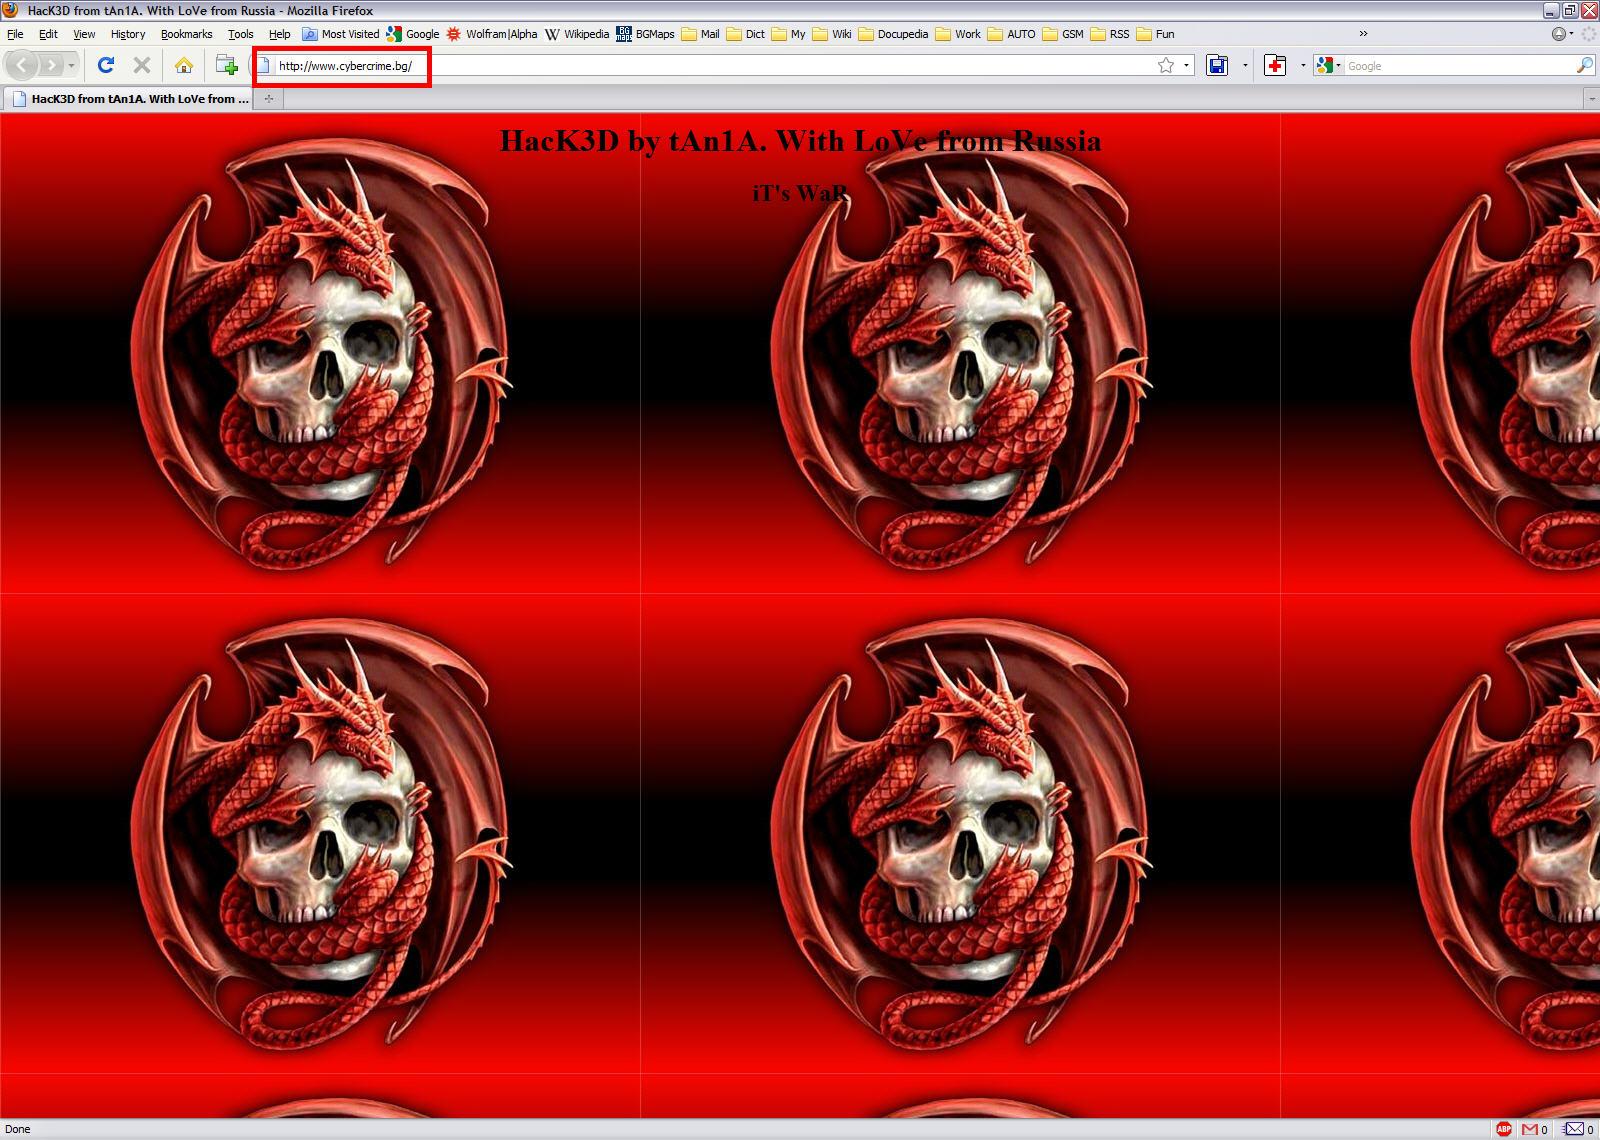 cybercrime.bg